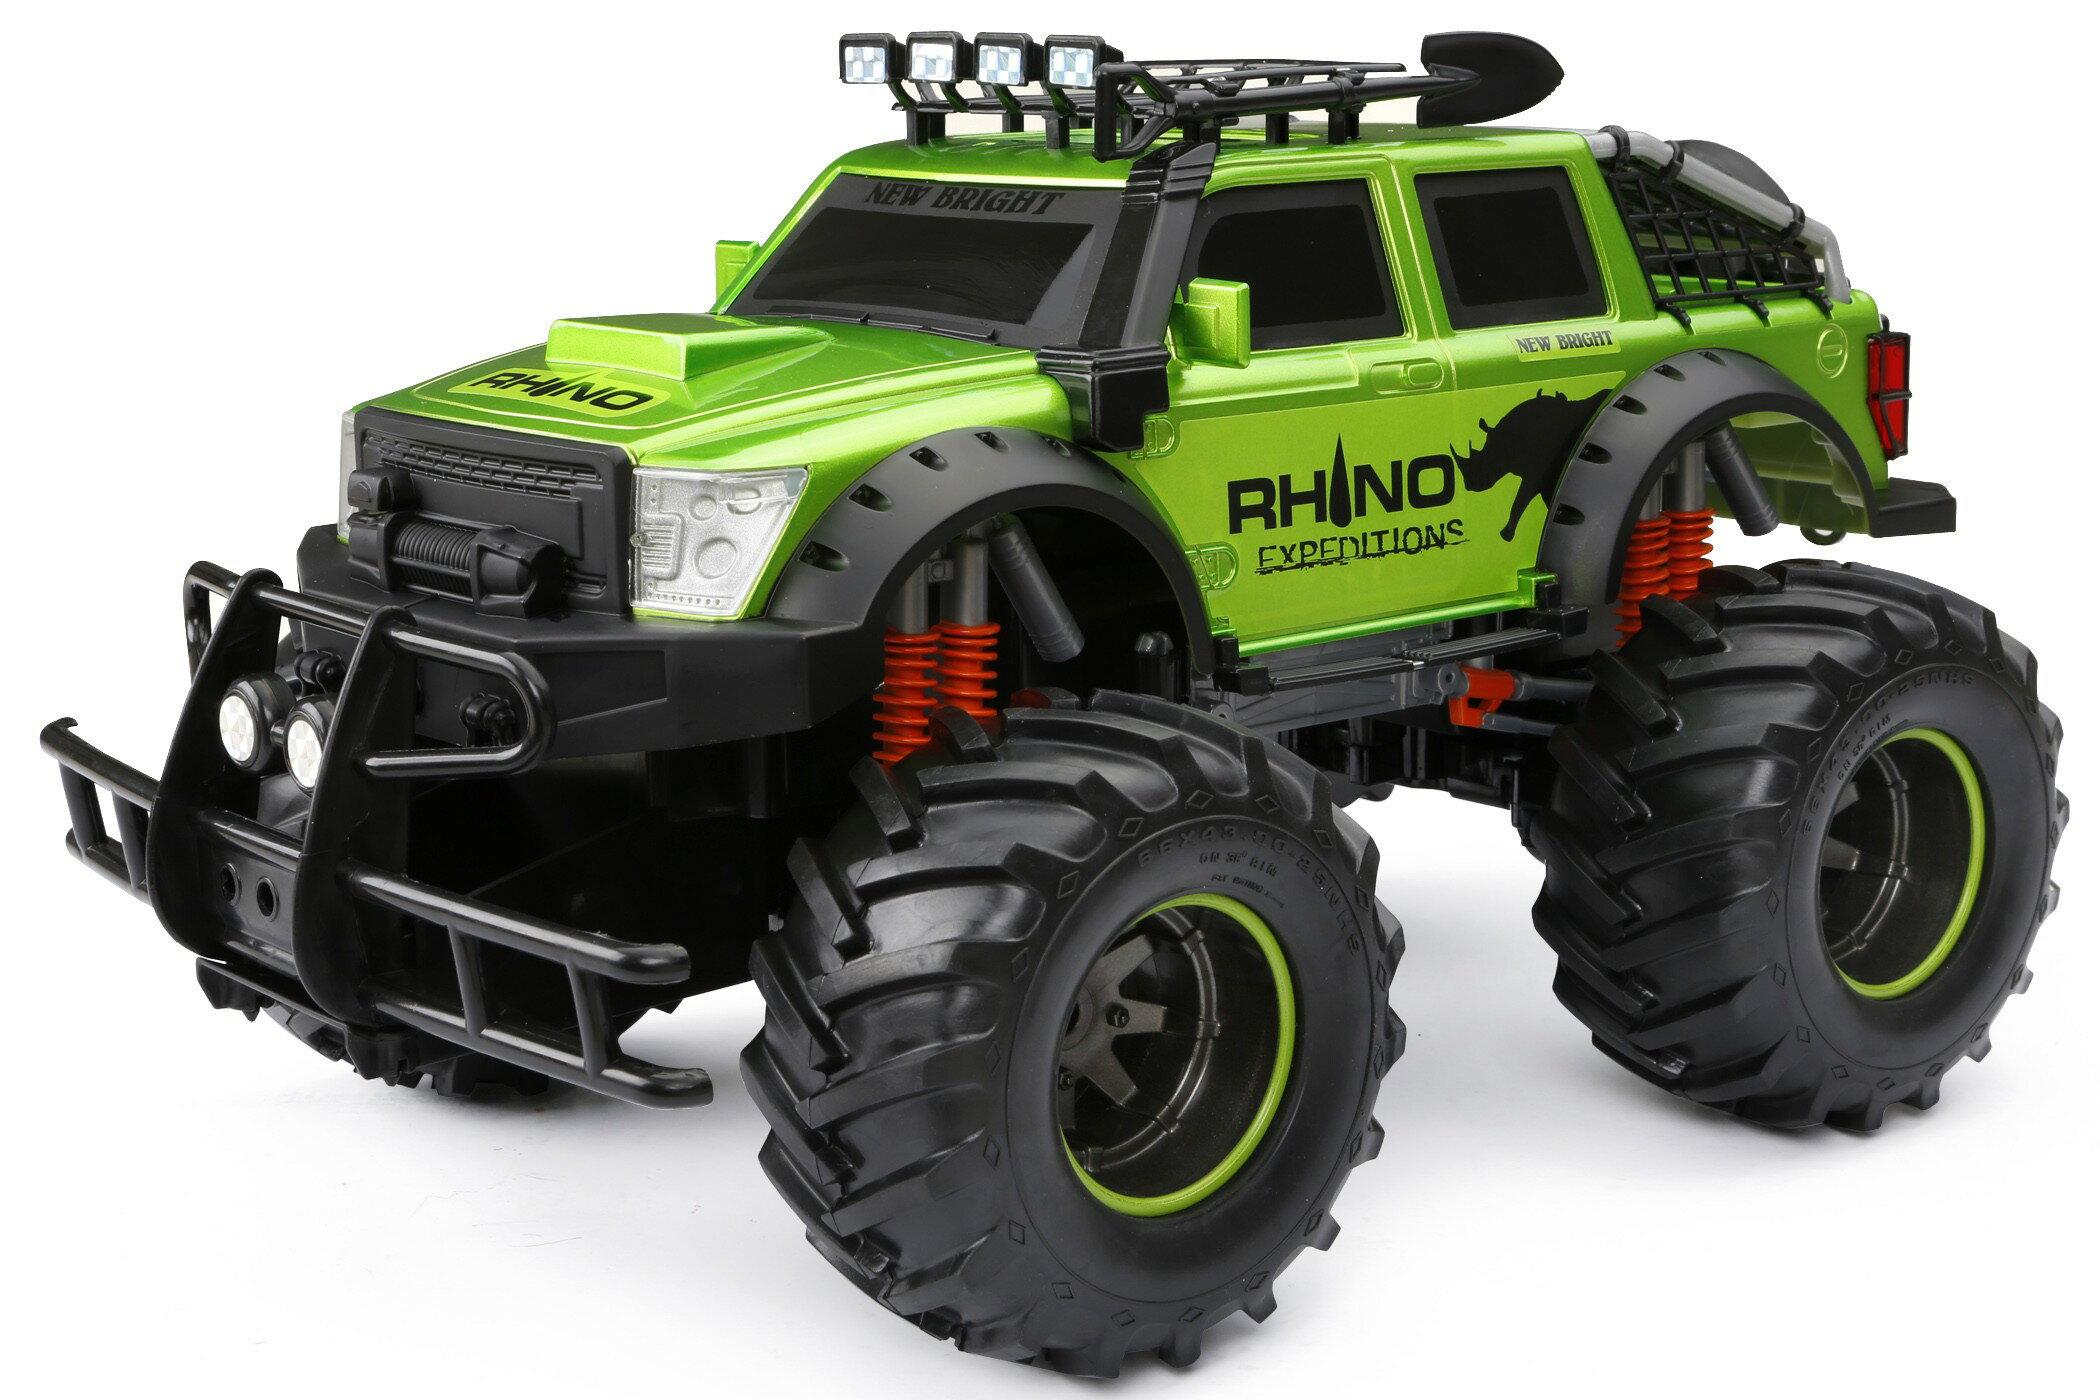 56f43099ecfcb Rakuten Home · Gizmo Toy. New Bright 4x4 Rhino Expeditions Full Function RC  Vehicle